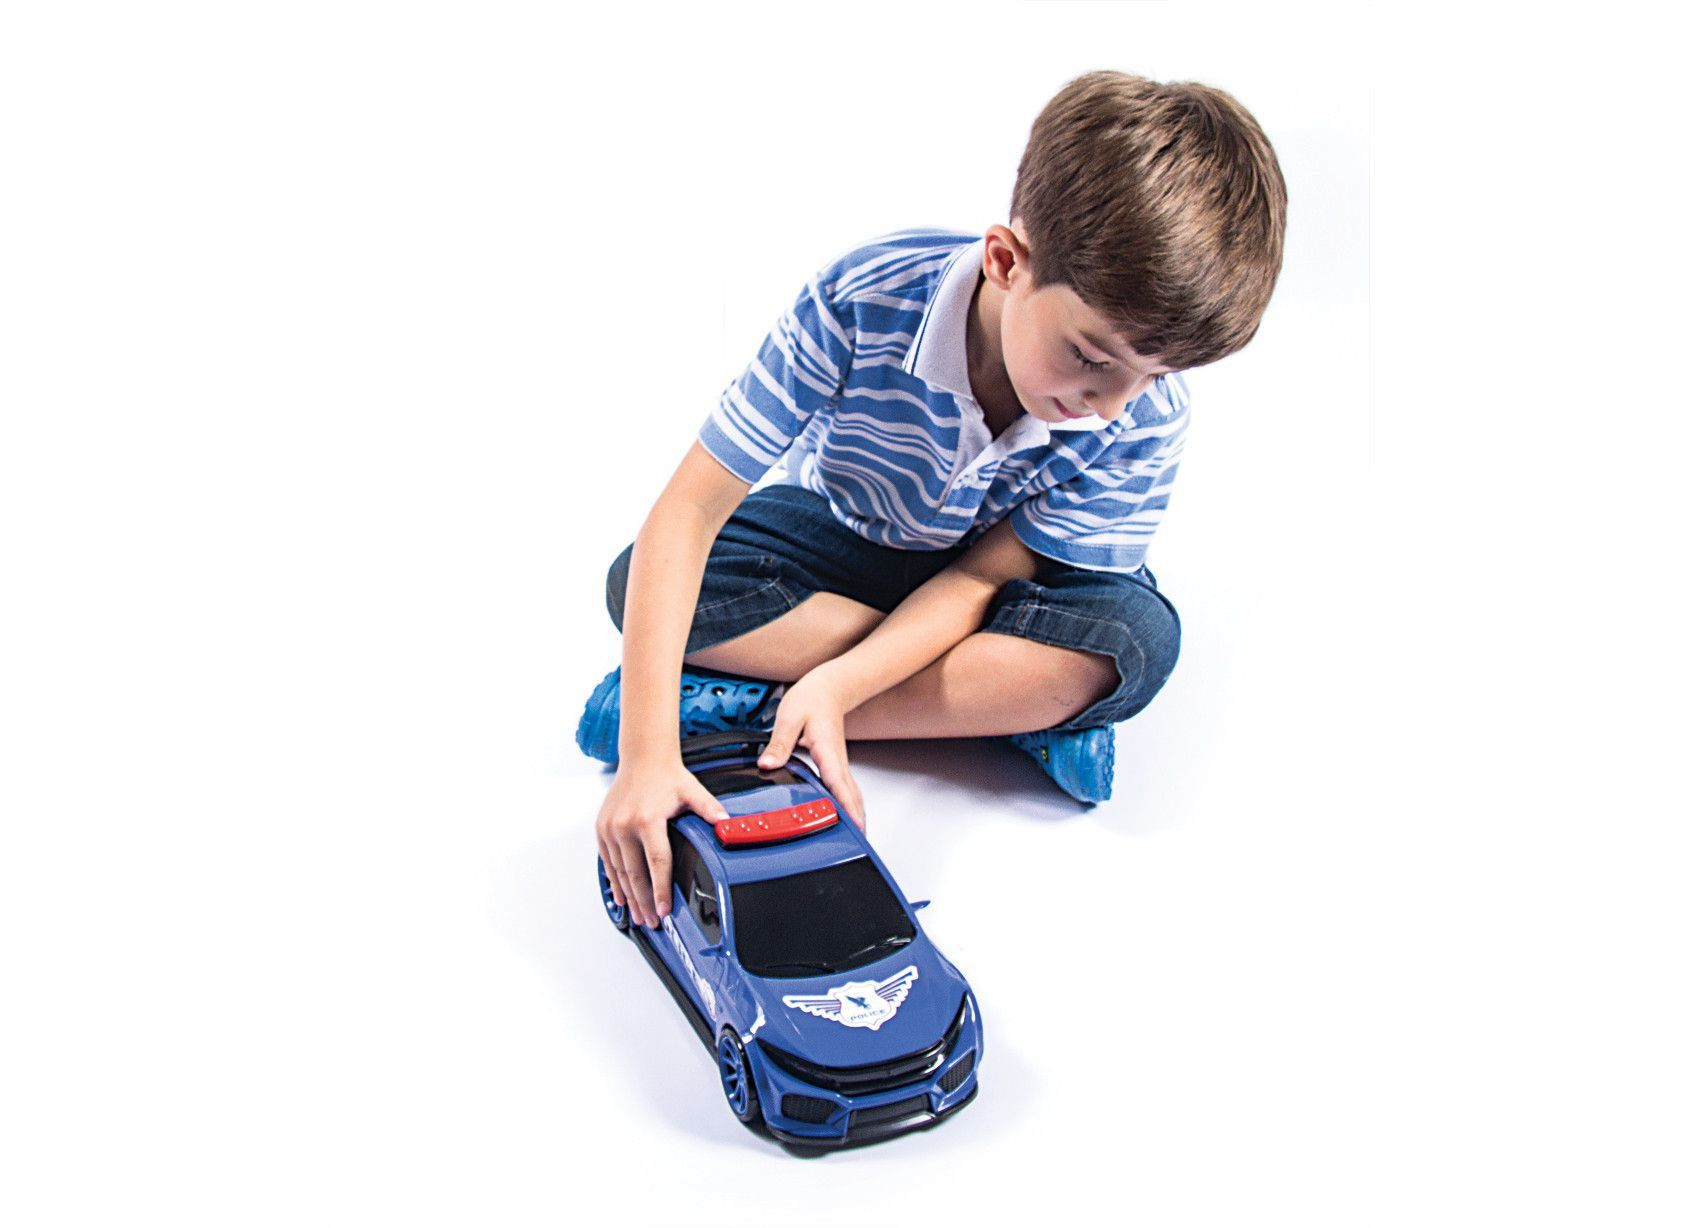 Carro Policia Verdum Max Bs Toys